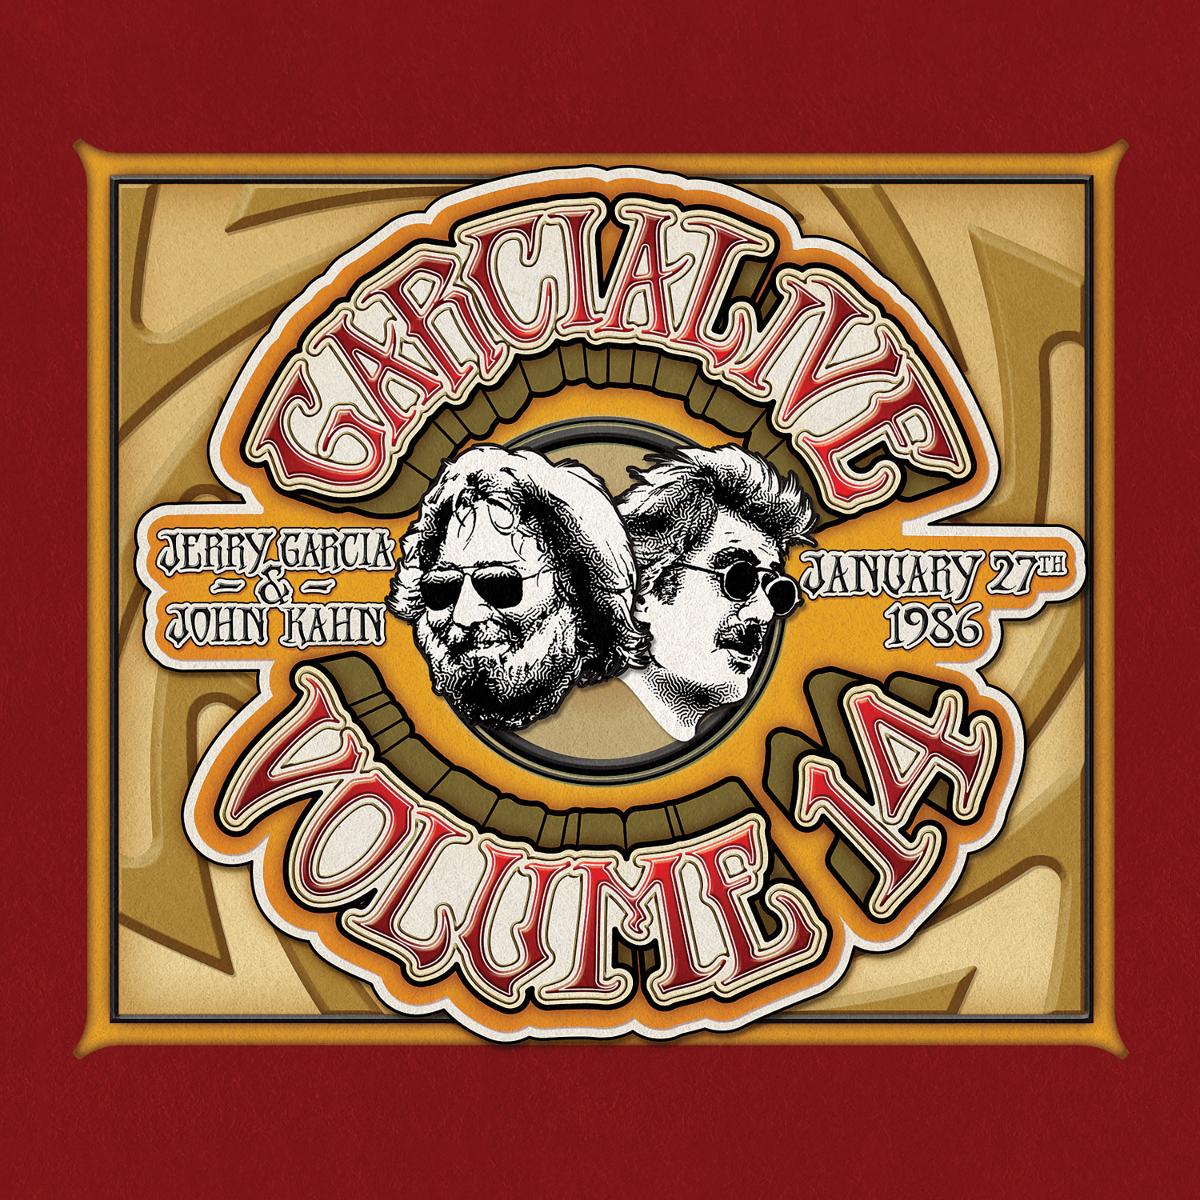 Jerry Garcia & John Kahn - GarciaLive Volume 14: 1/27/86 CD